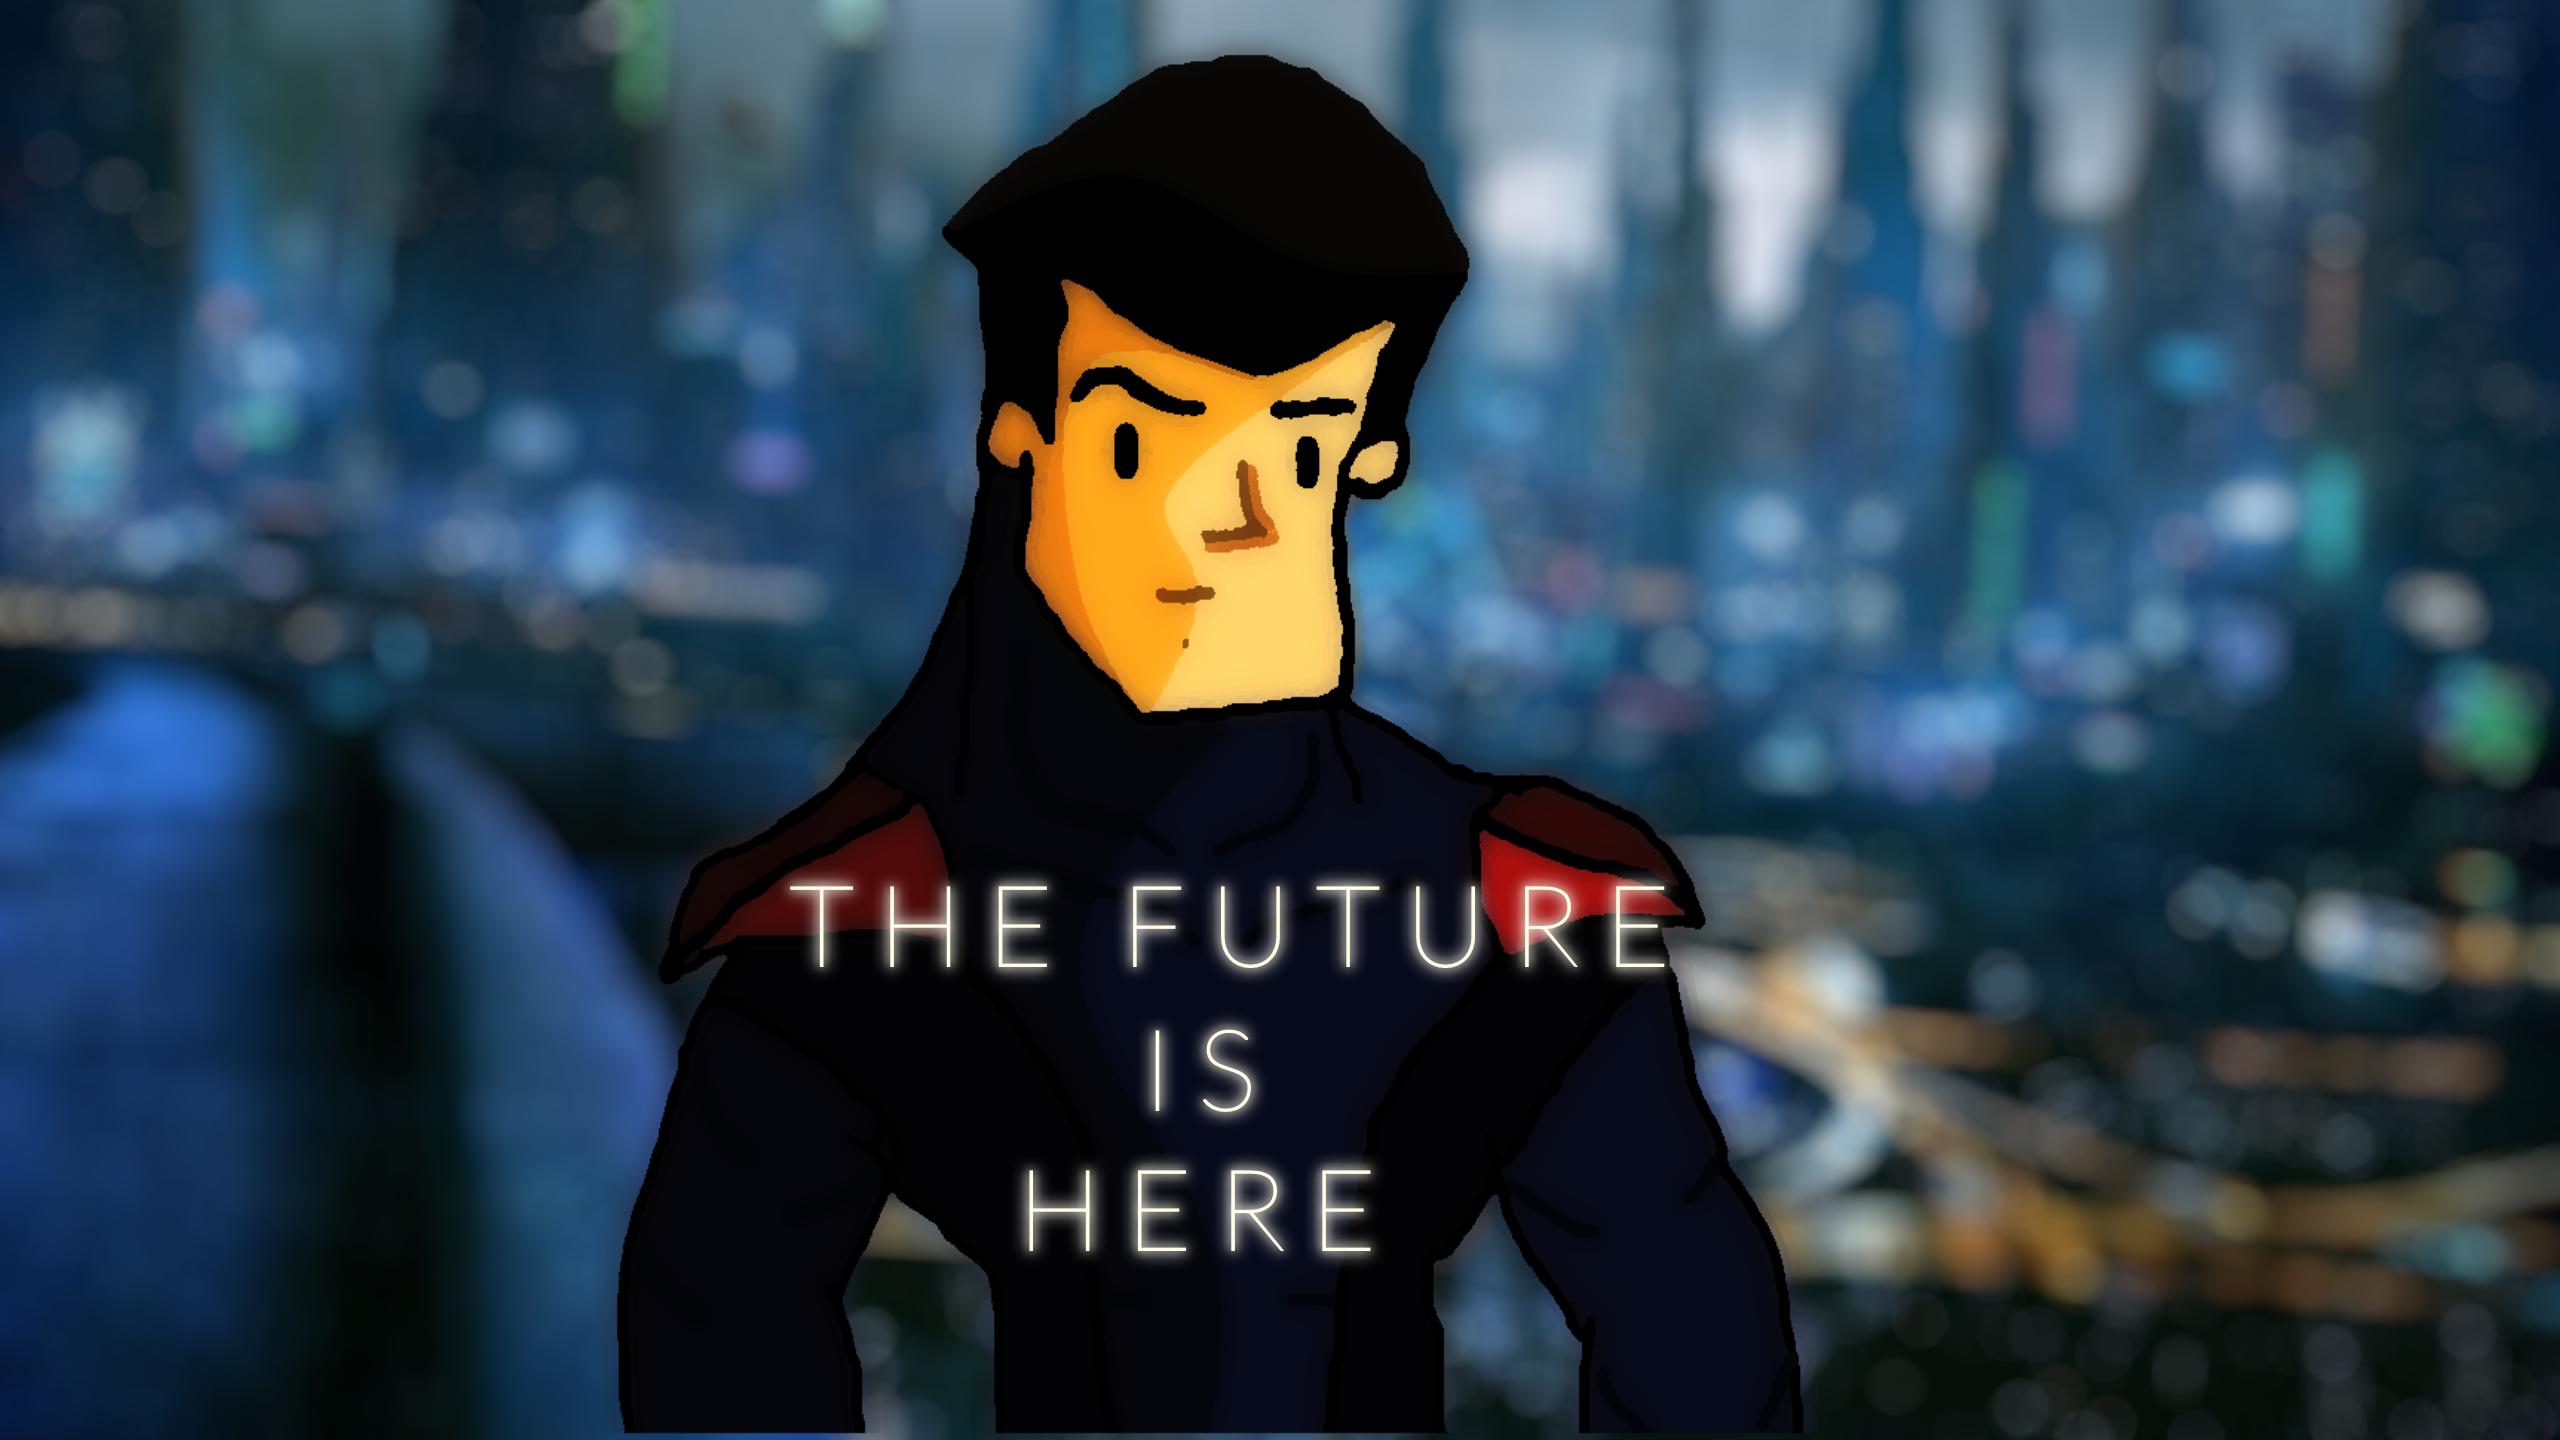 Future - Man